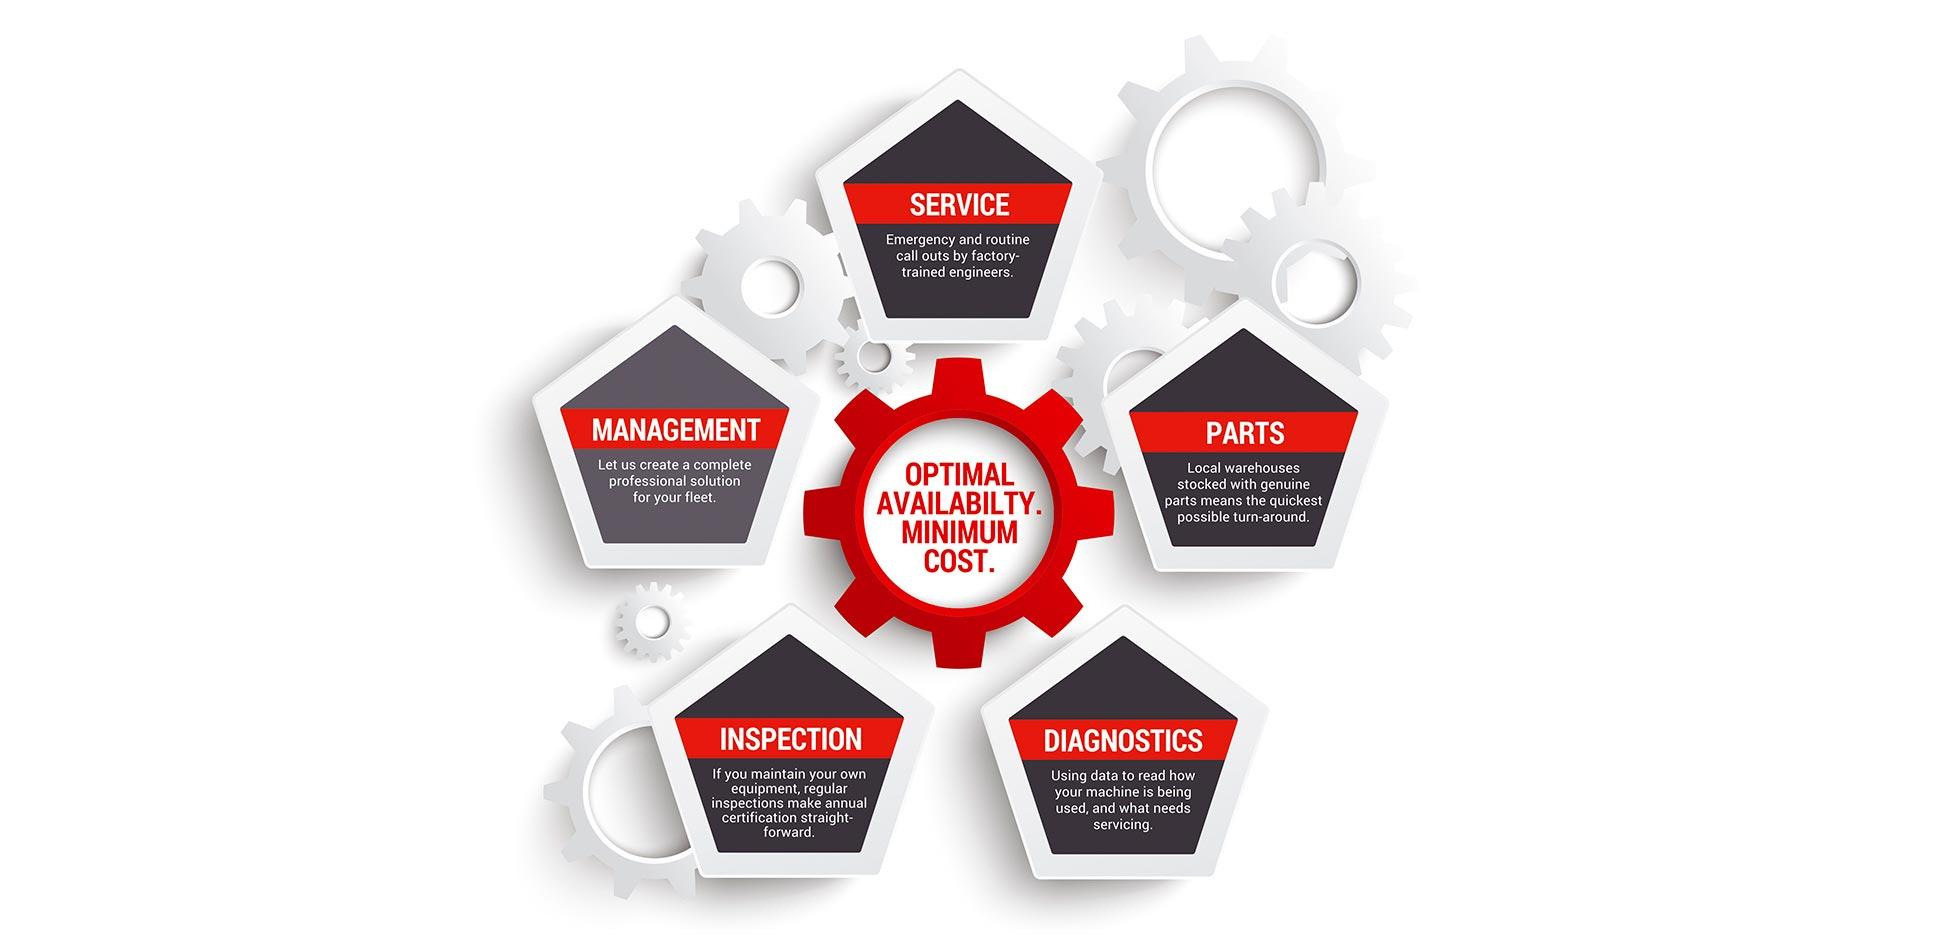 Optimal Availability. Minimum Cost.